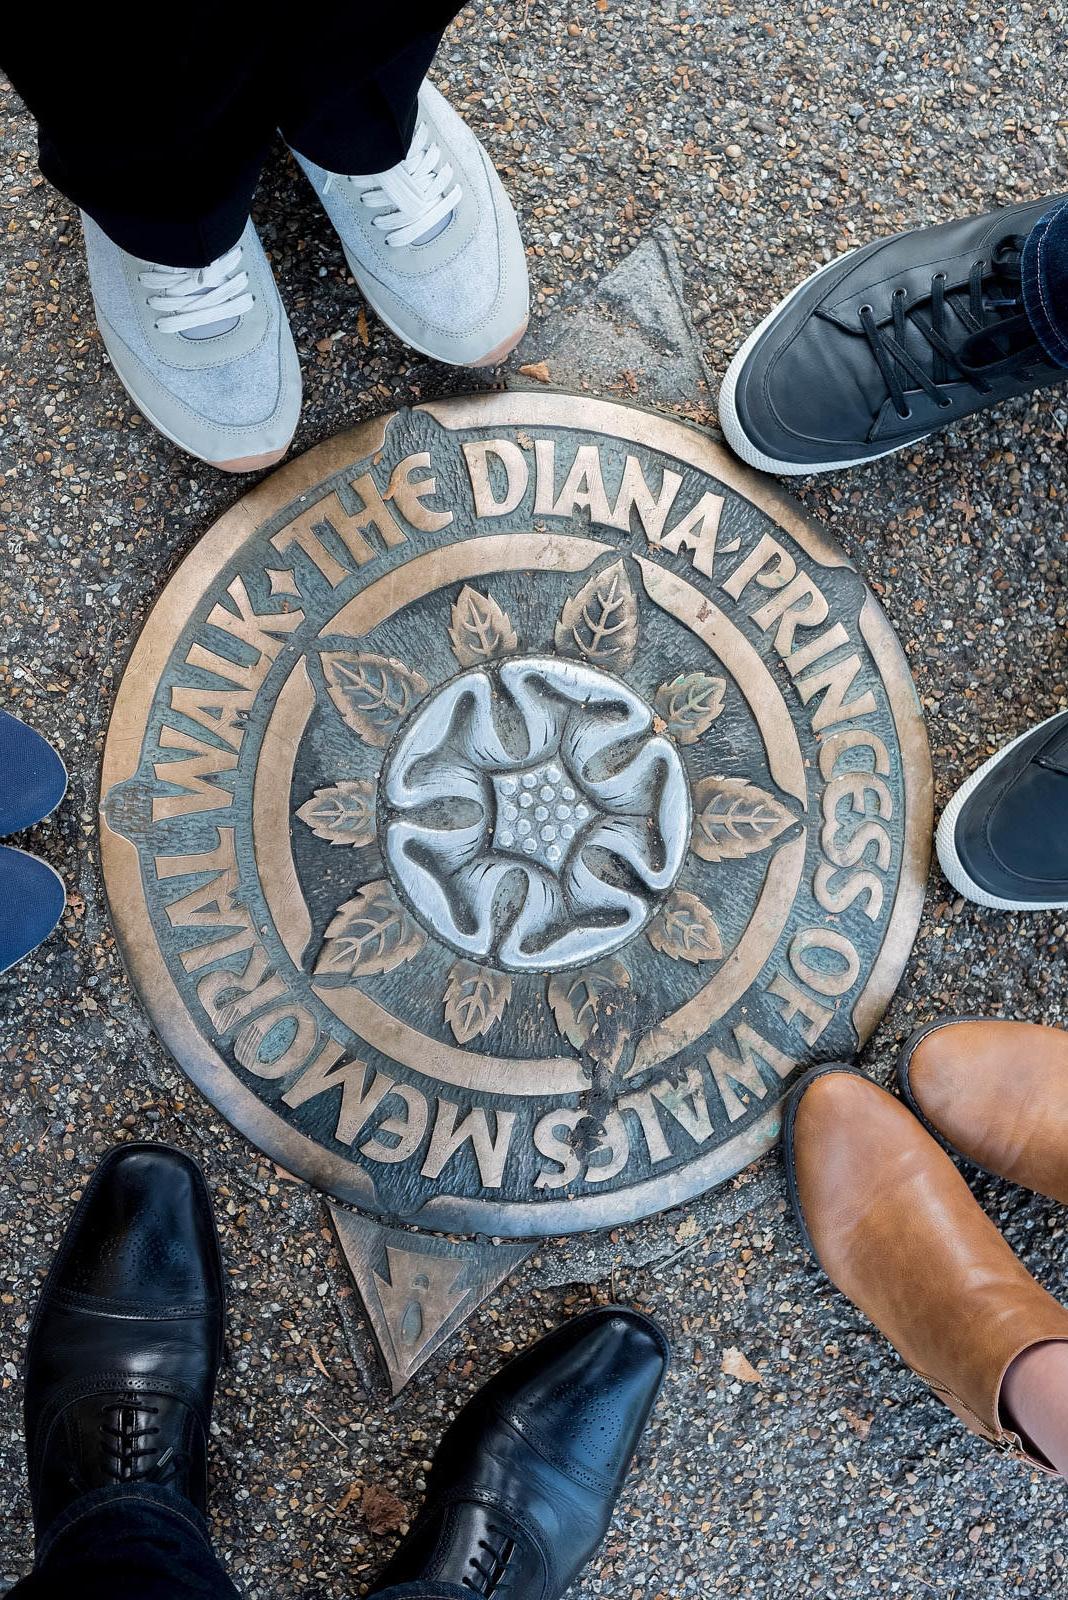 Hyde Park London Diana Princess of Wales Memorial Walk